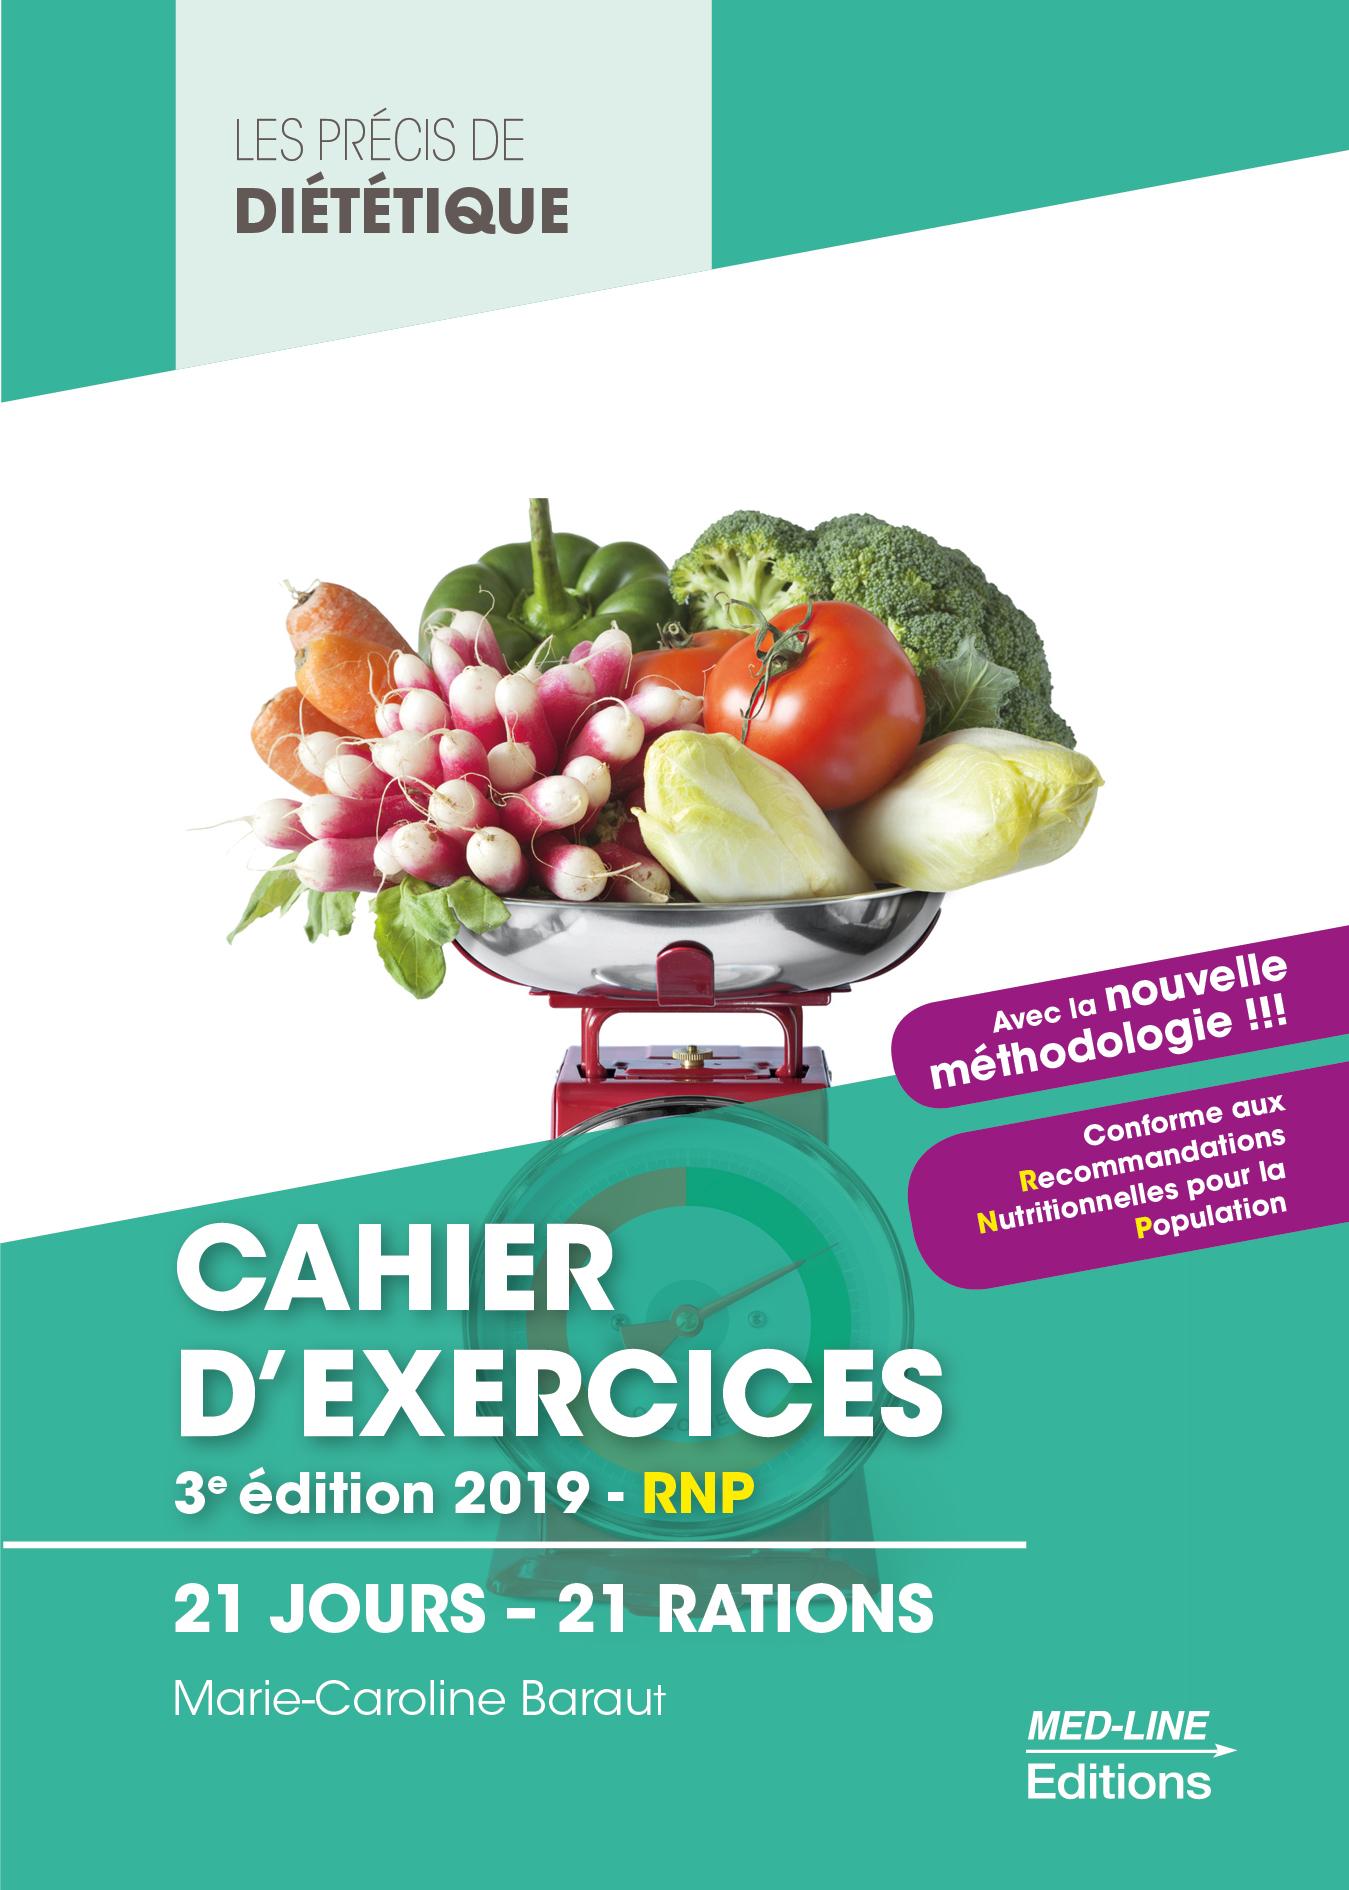 Cahier d'exercices. 3e éditions 2019 – RNP 21 jours – 21 rations